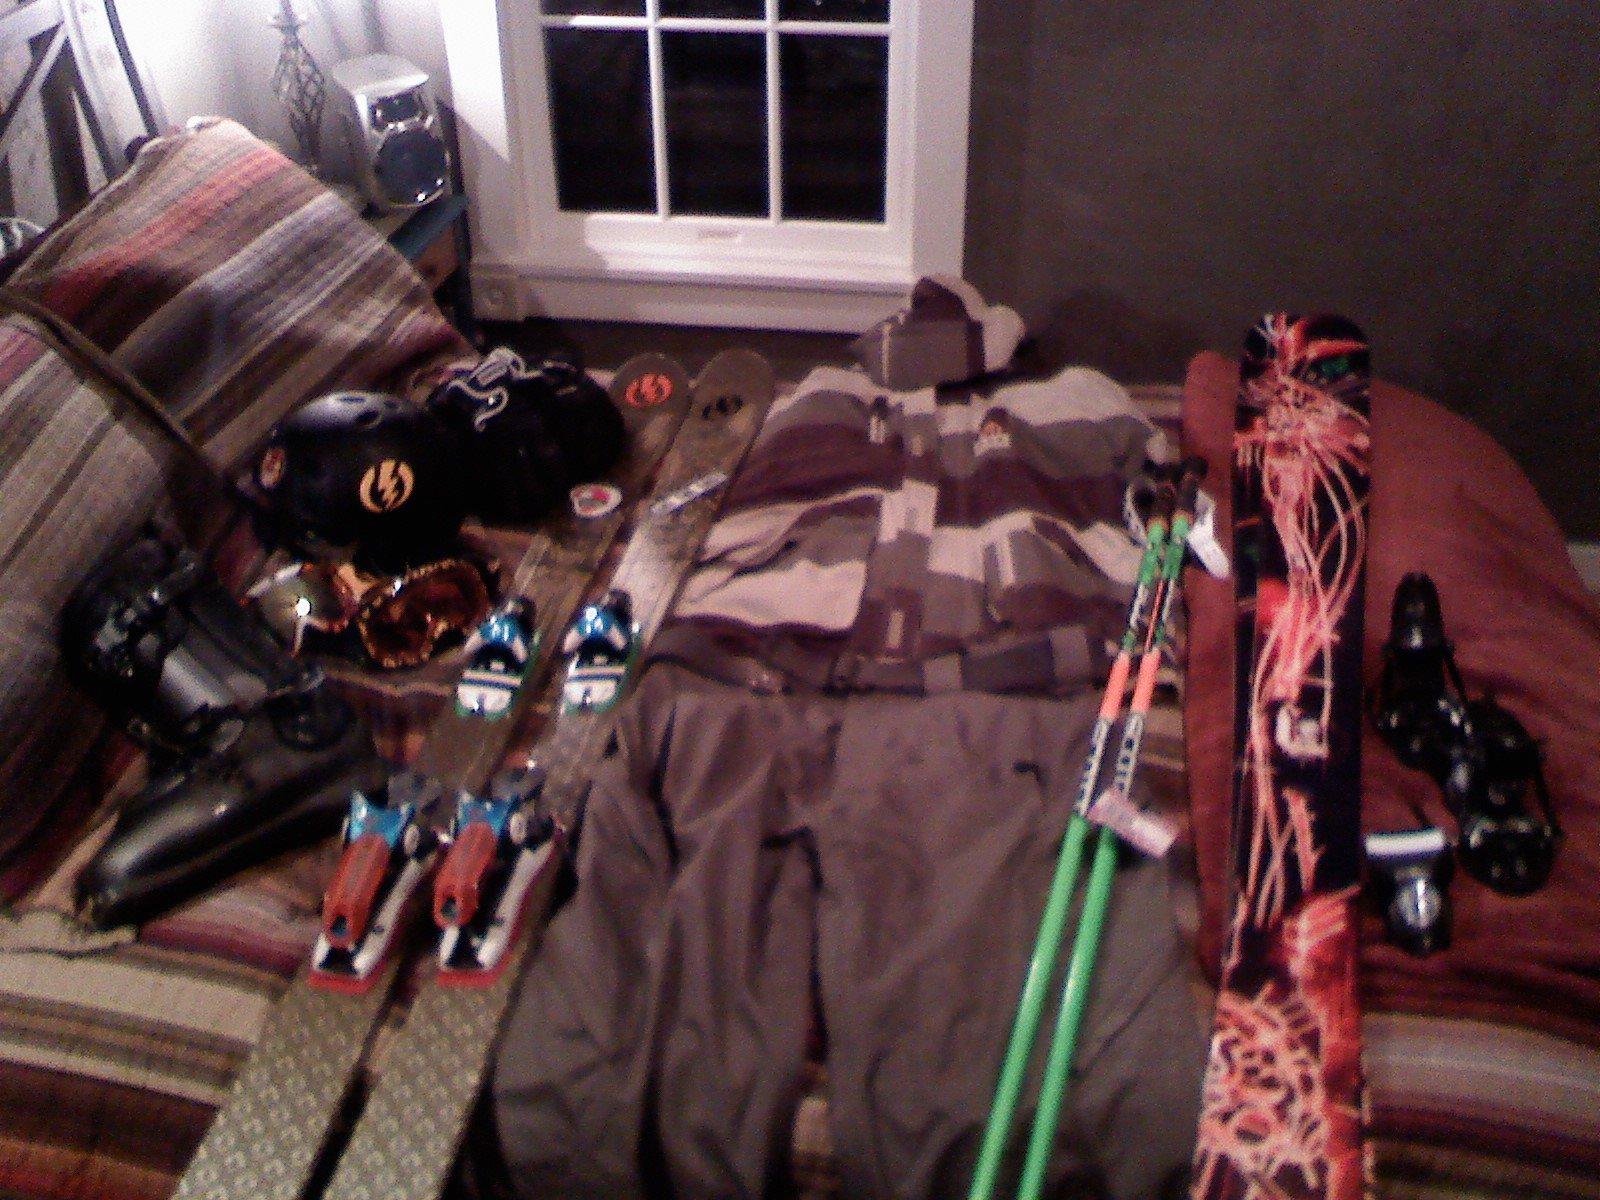 09 set up